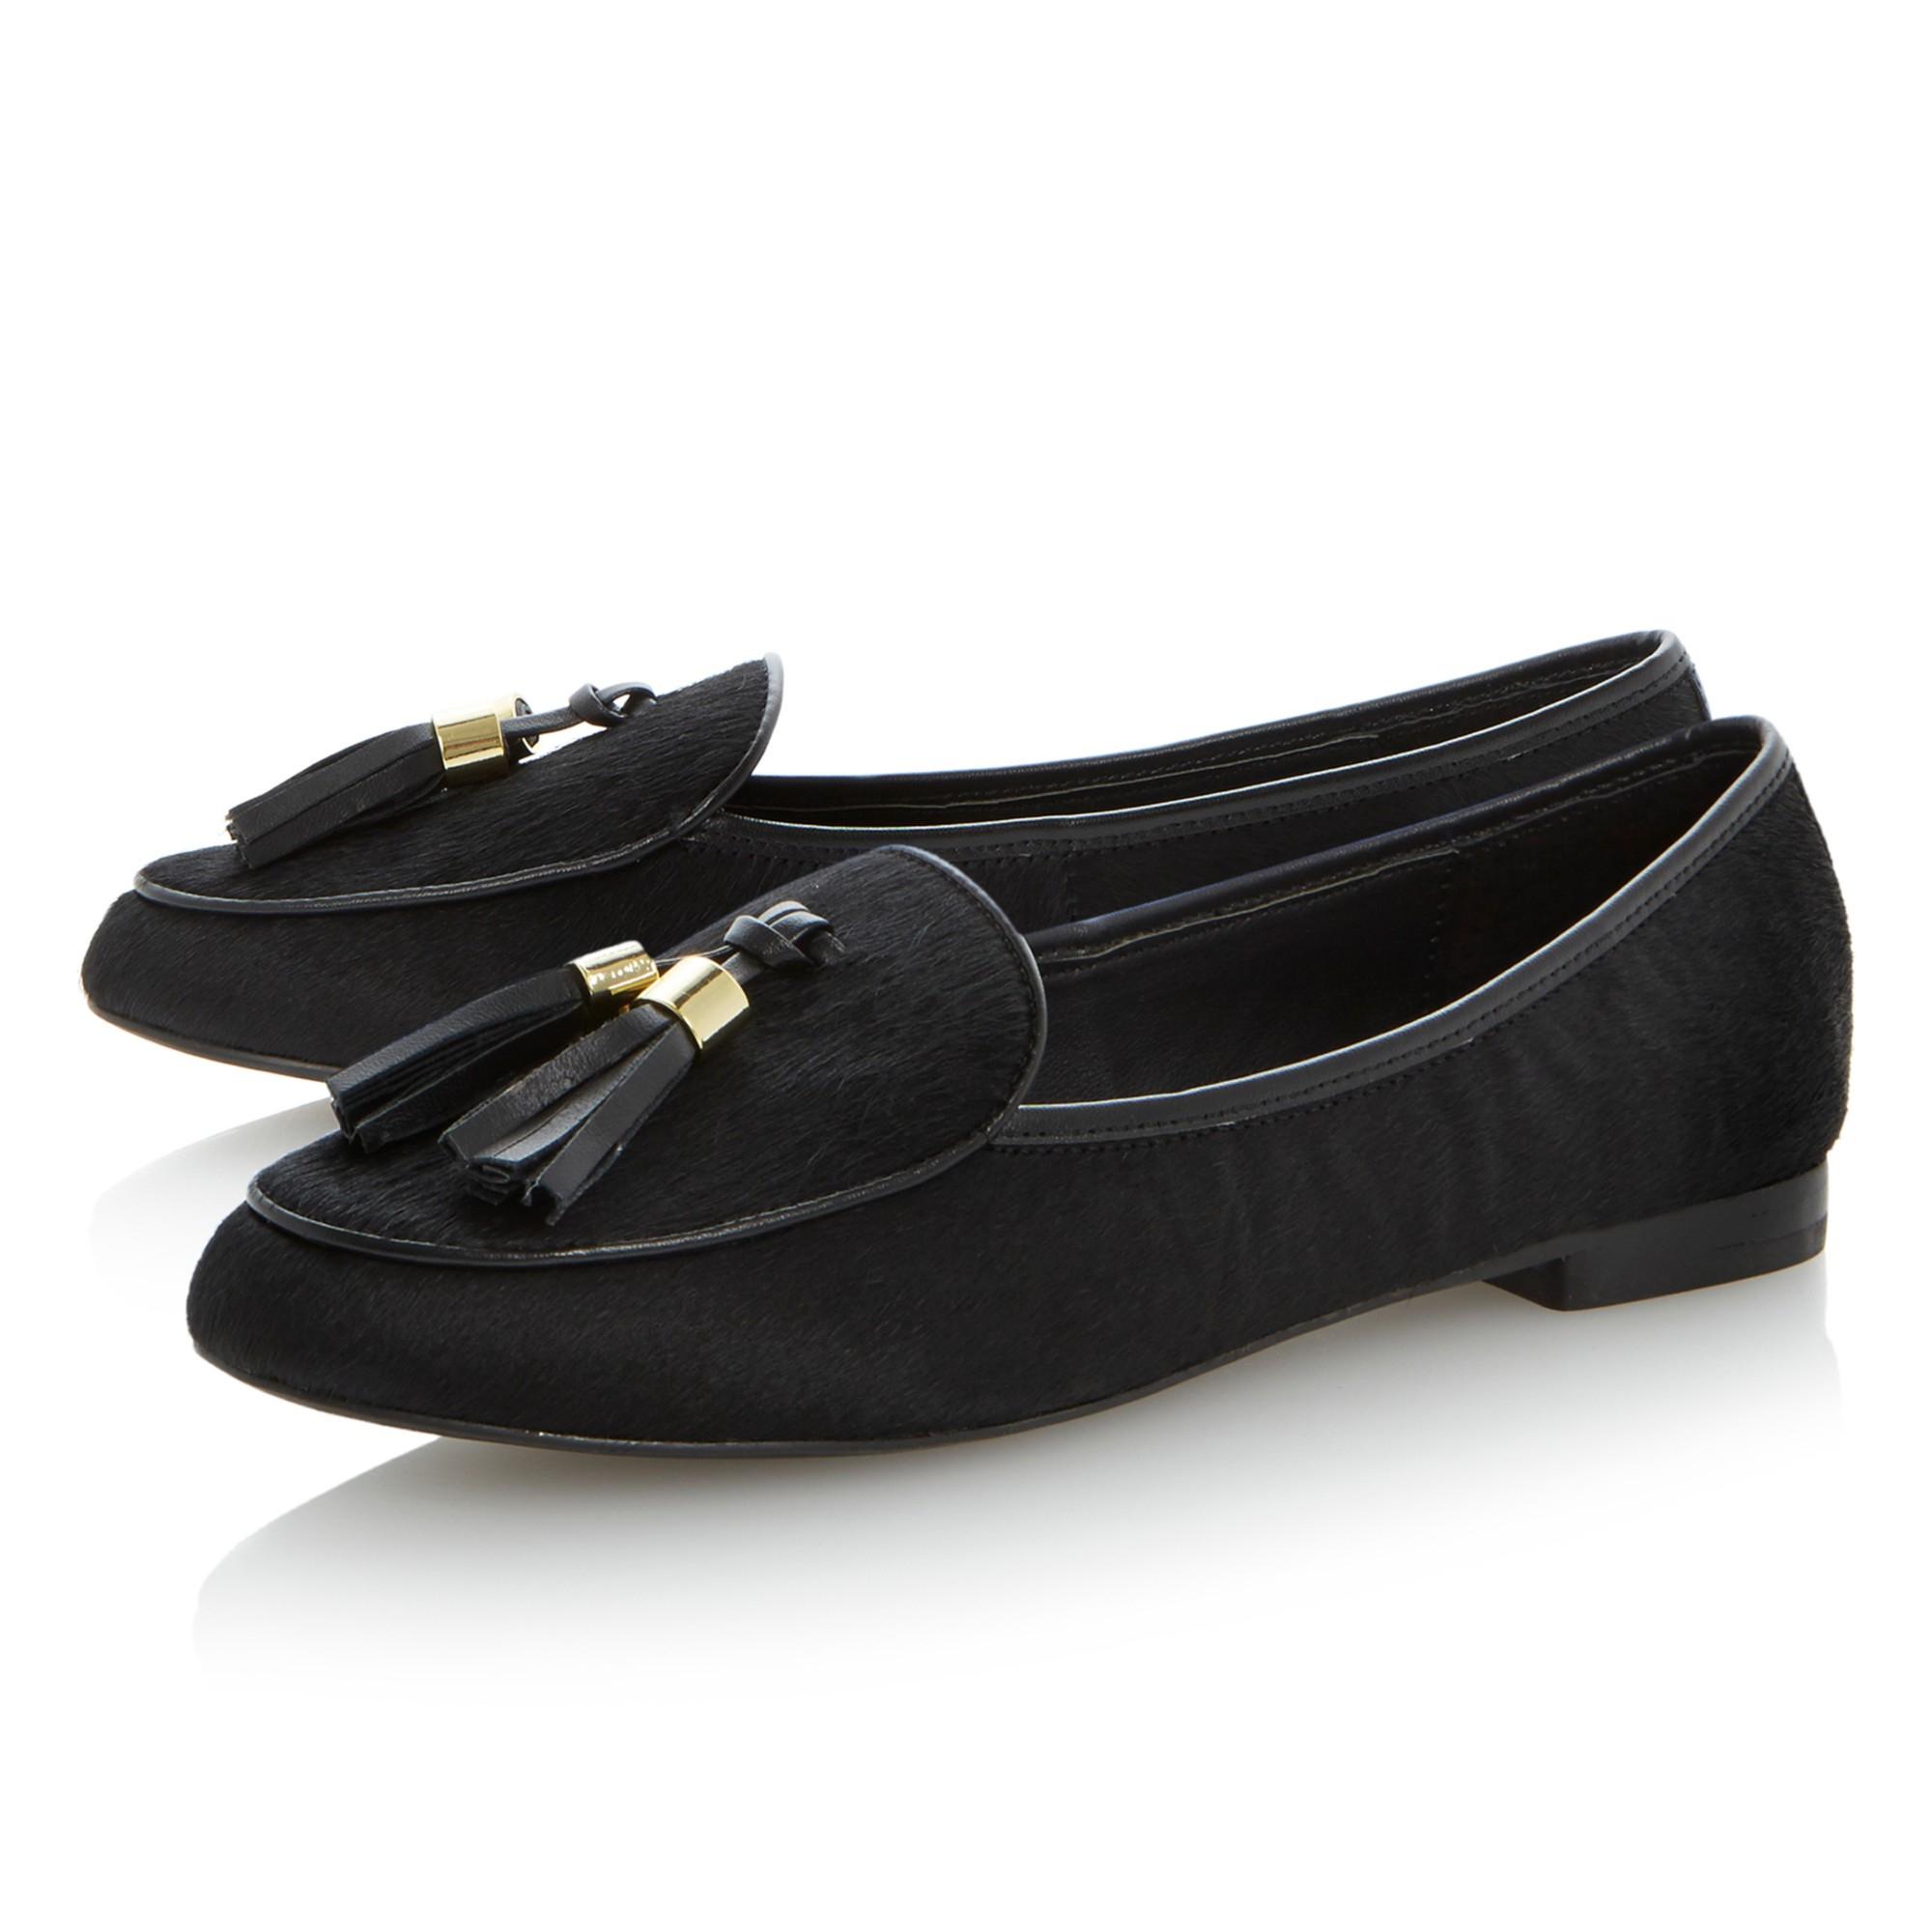 cd1d766c2ba Steve Madden Lunni Pony Tassle Flat Loafers in Black - Lyst